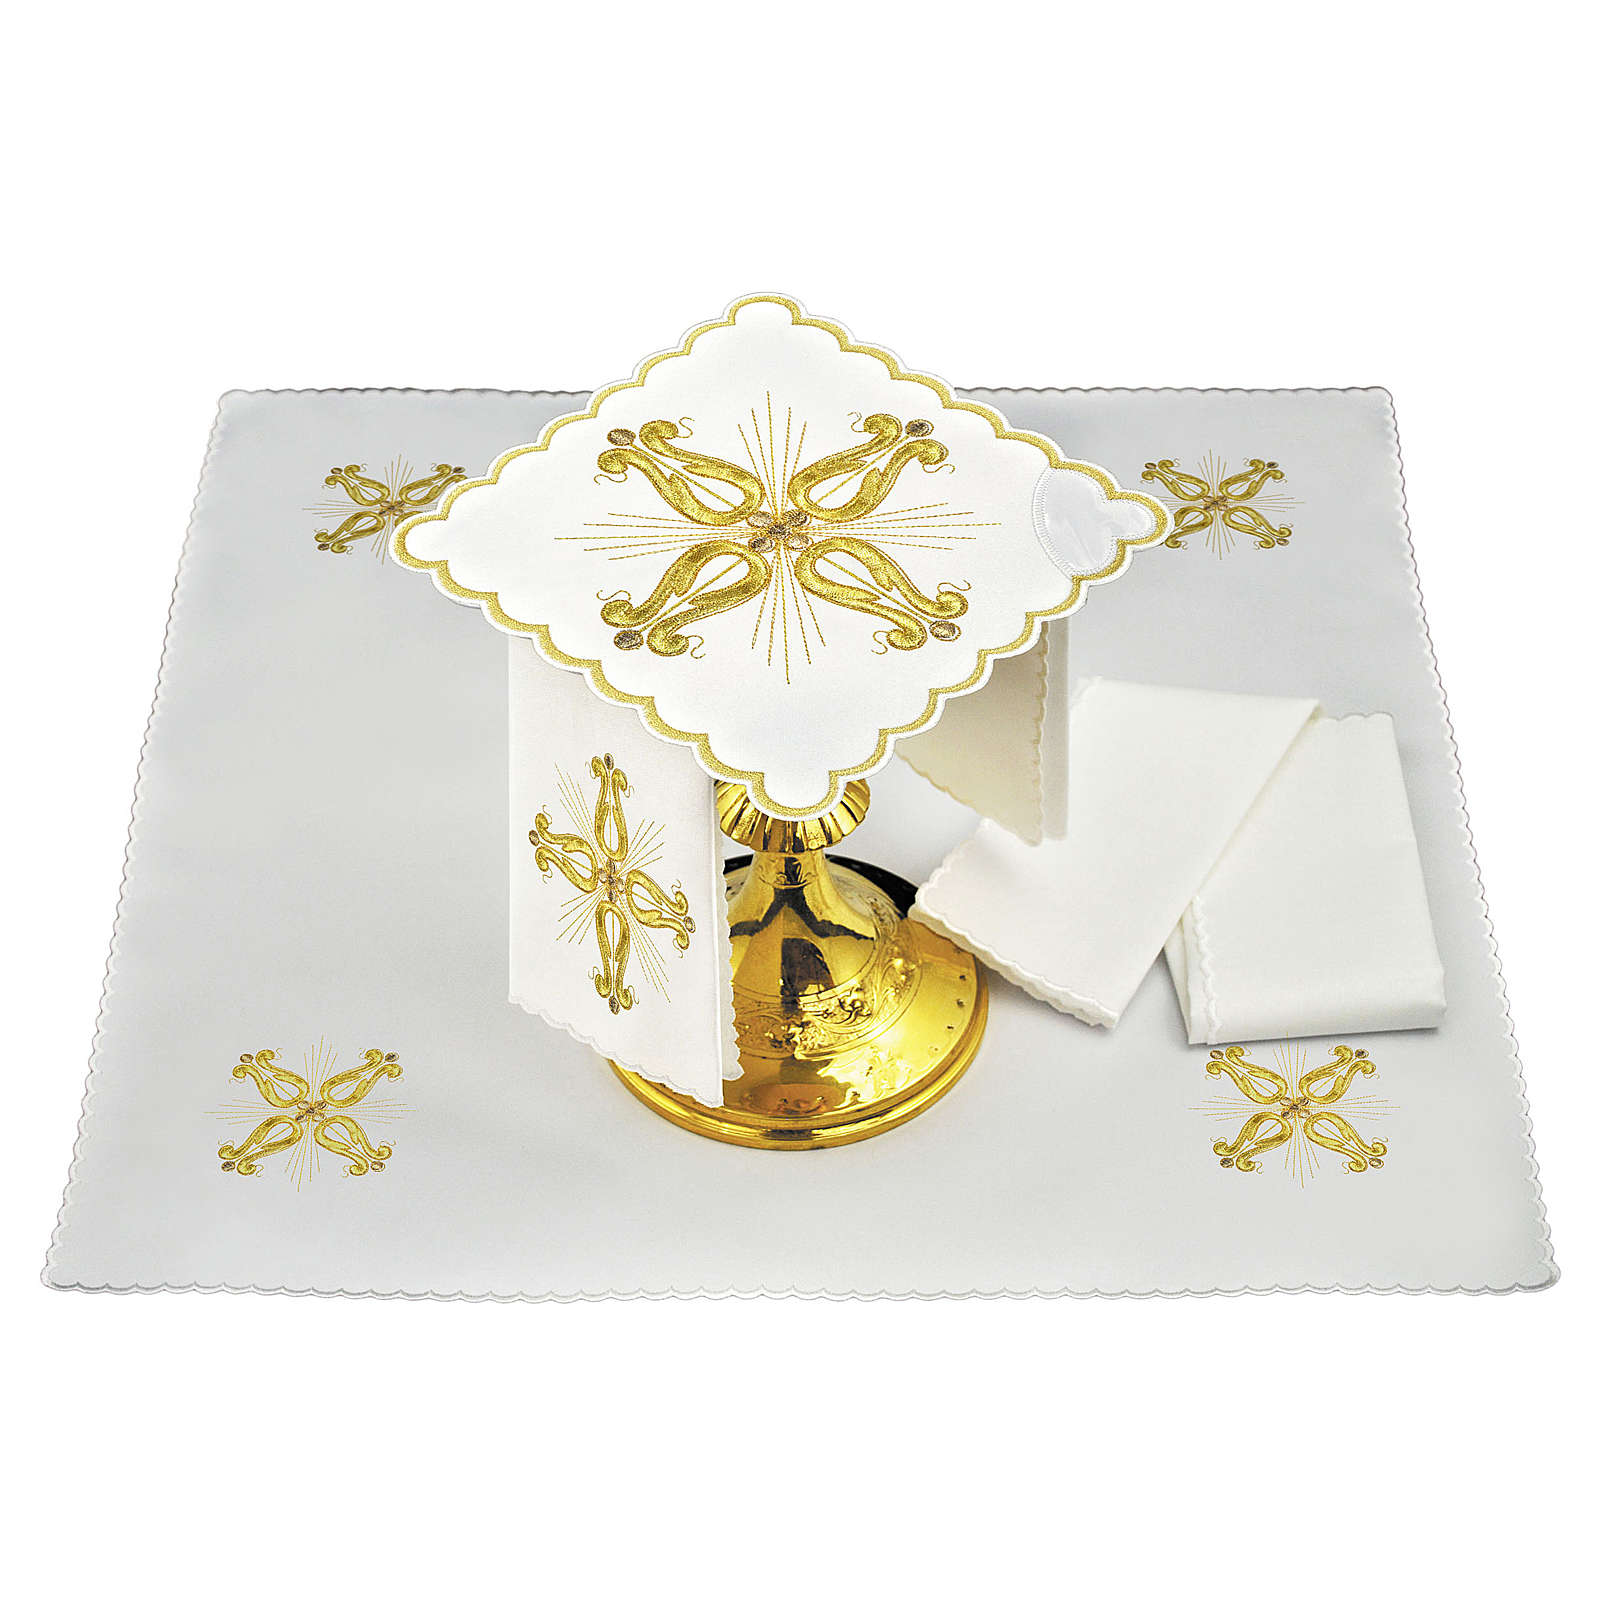 Servicio de altar algodón cruz dorada barroca con flor central 4